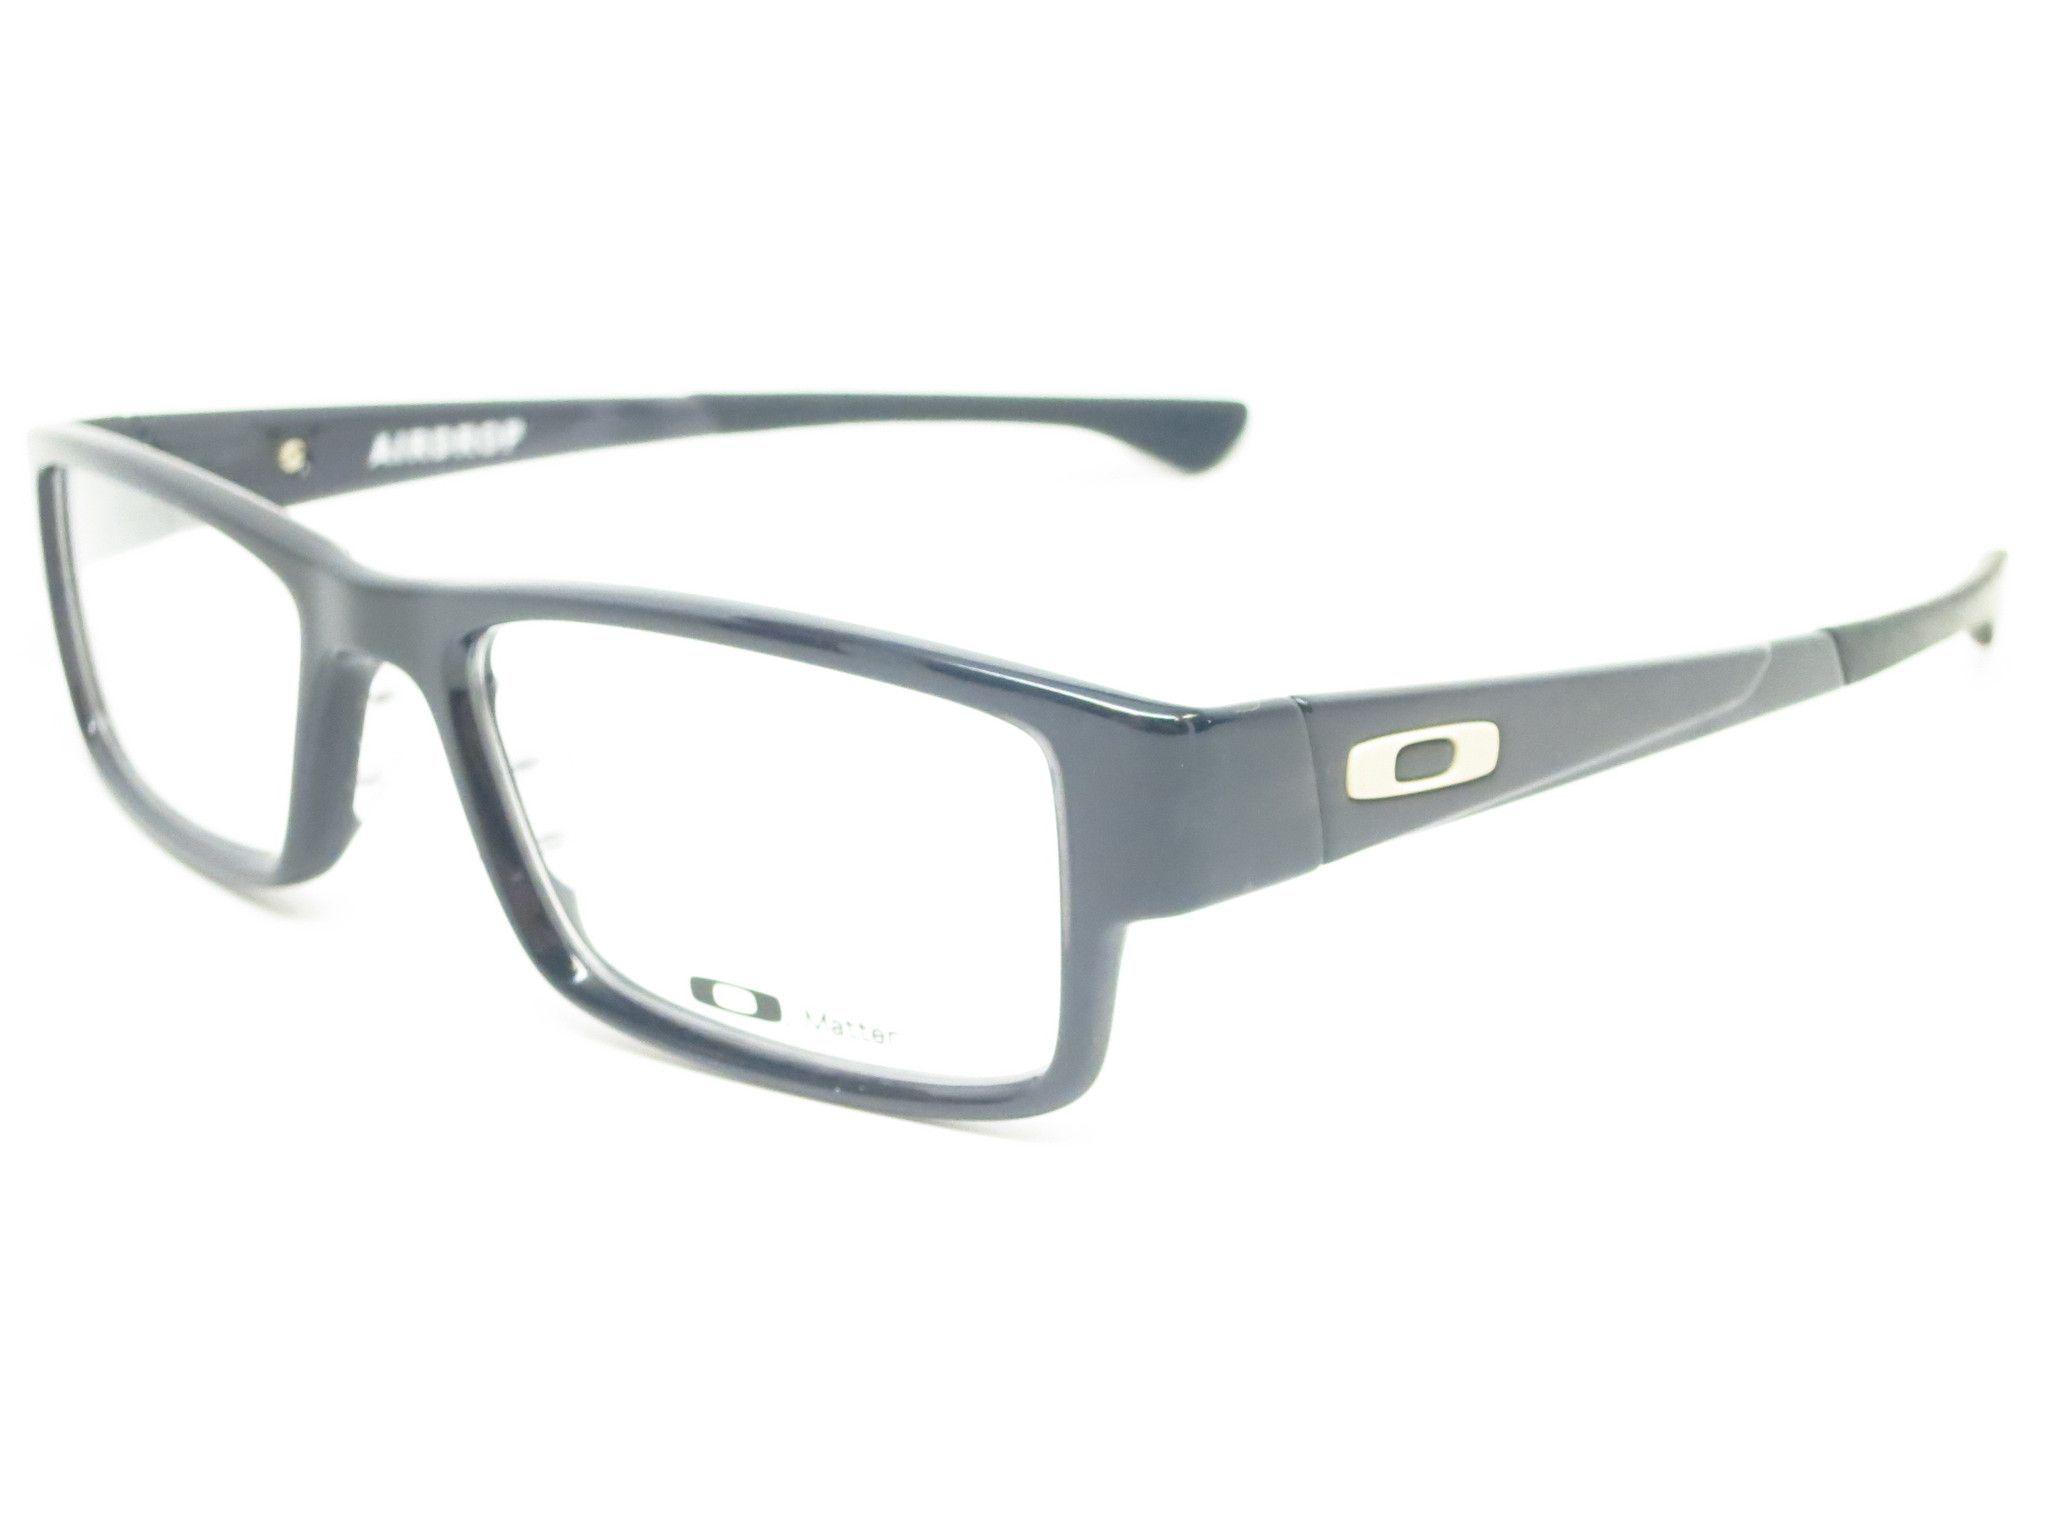 Oakley Airdrop OX8046-0253 Black Ink Eyeglasses | Pinterest | Oakley ...